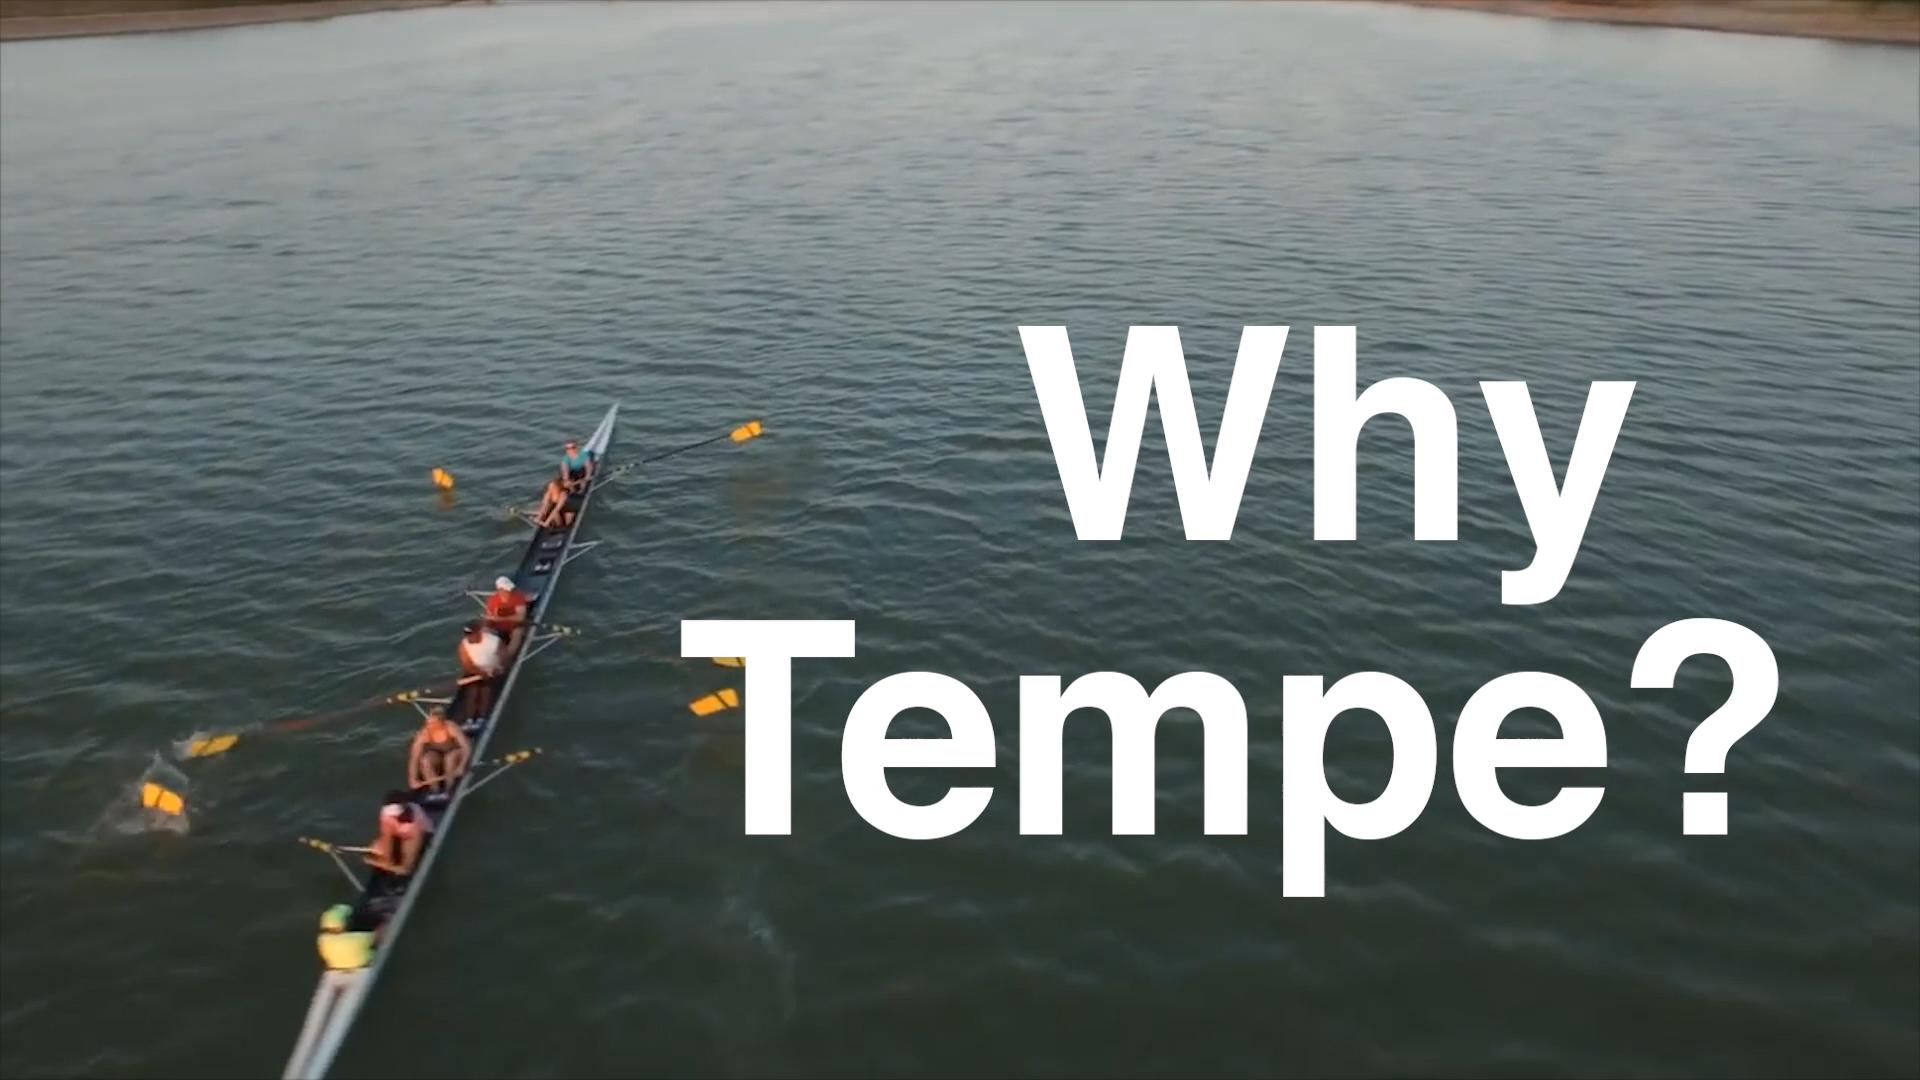 WATERMARK TEMPE – JGroup